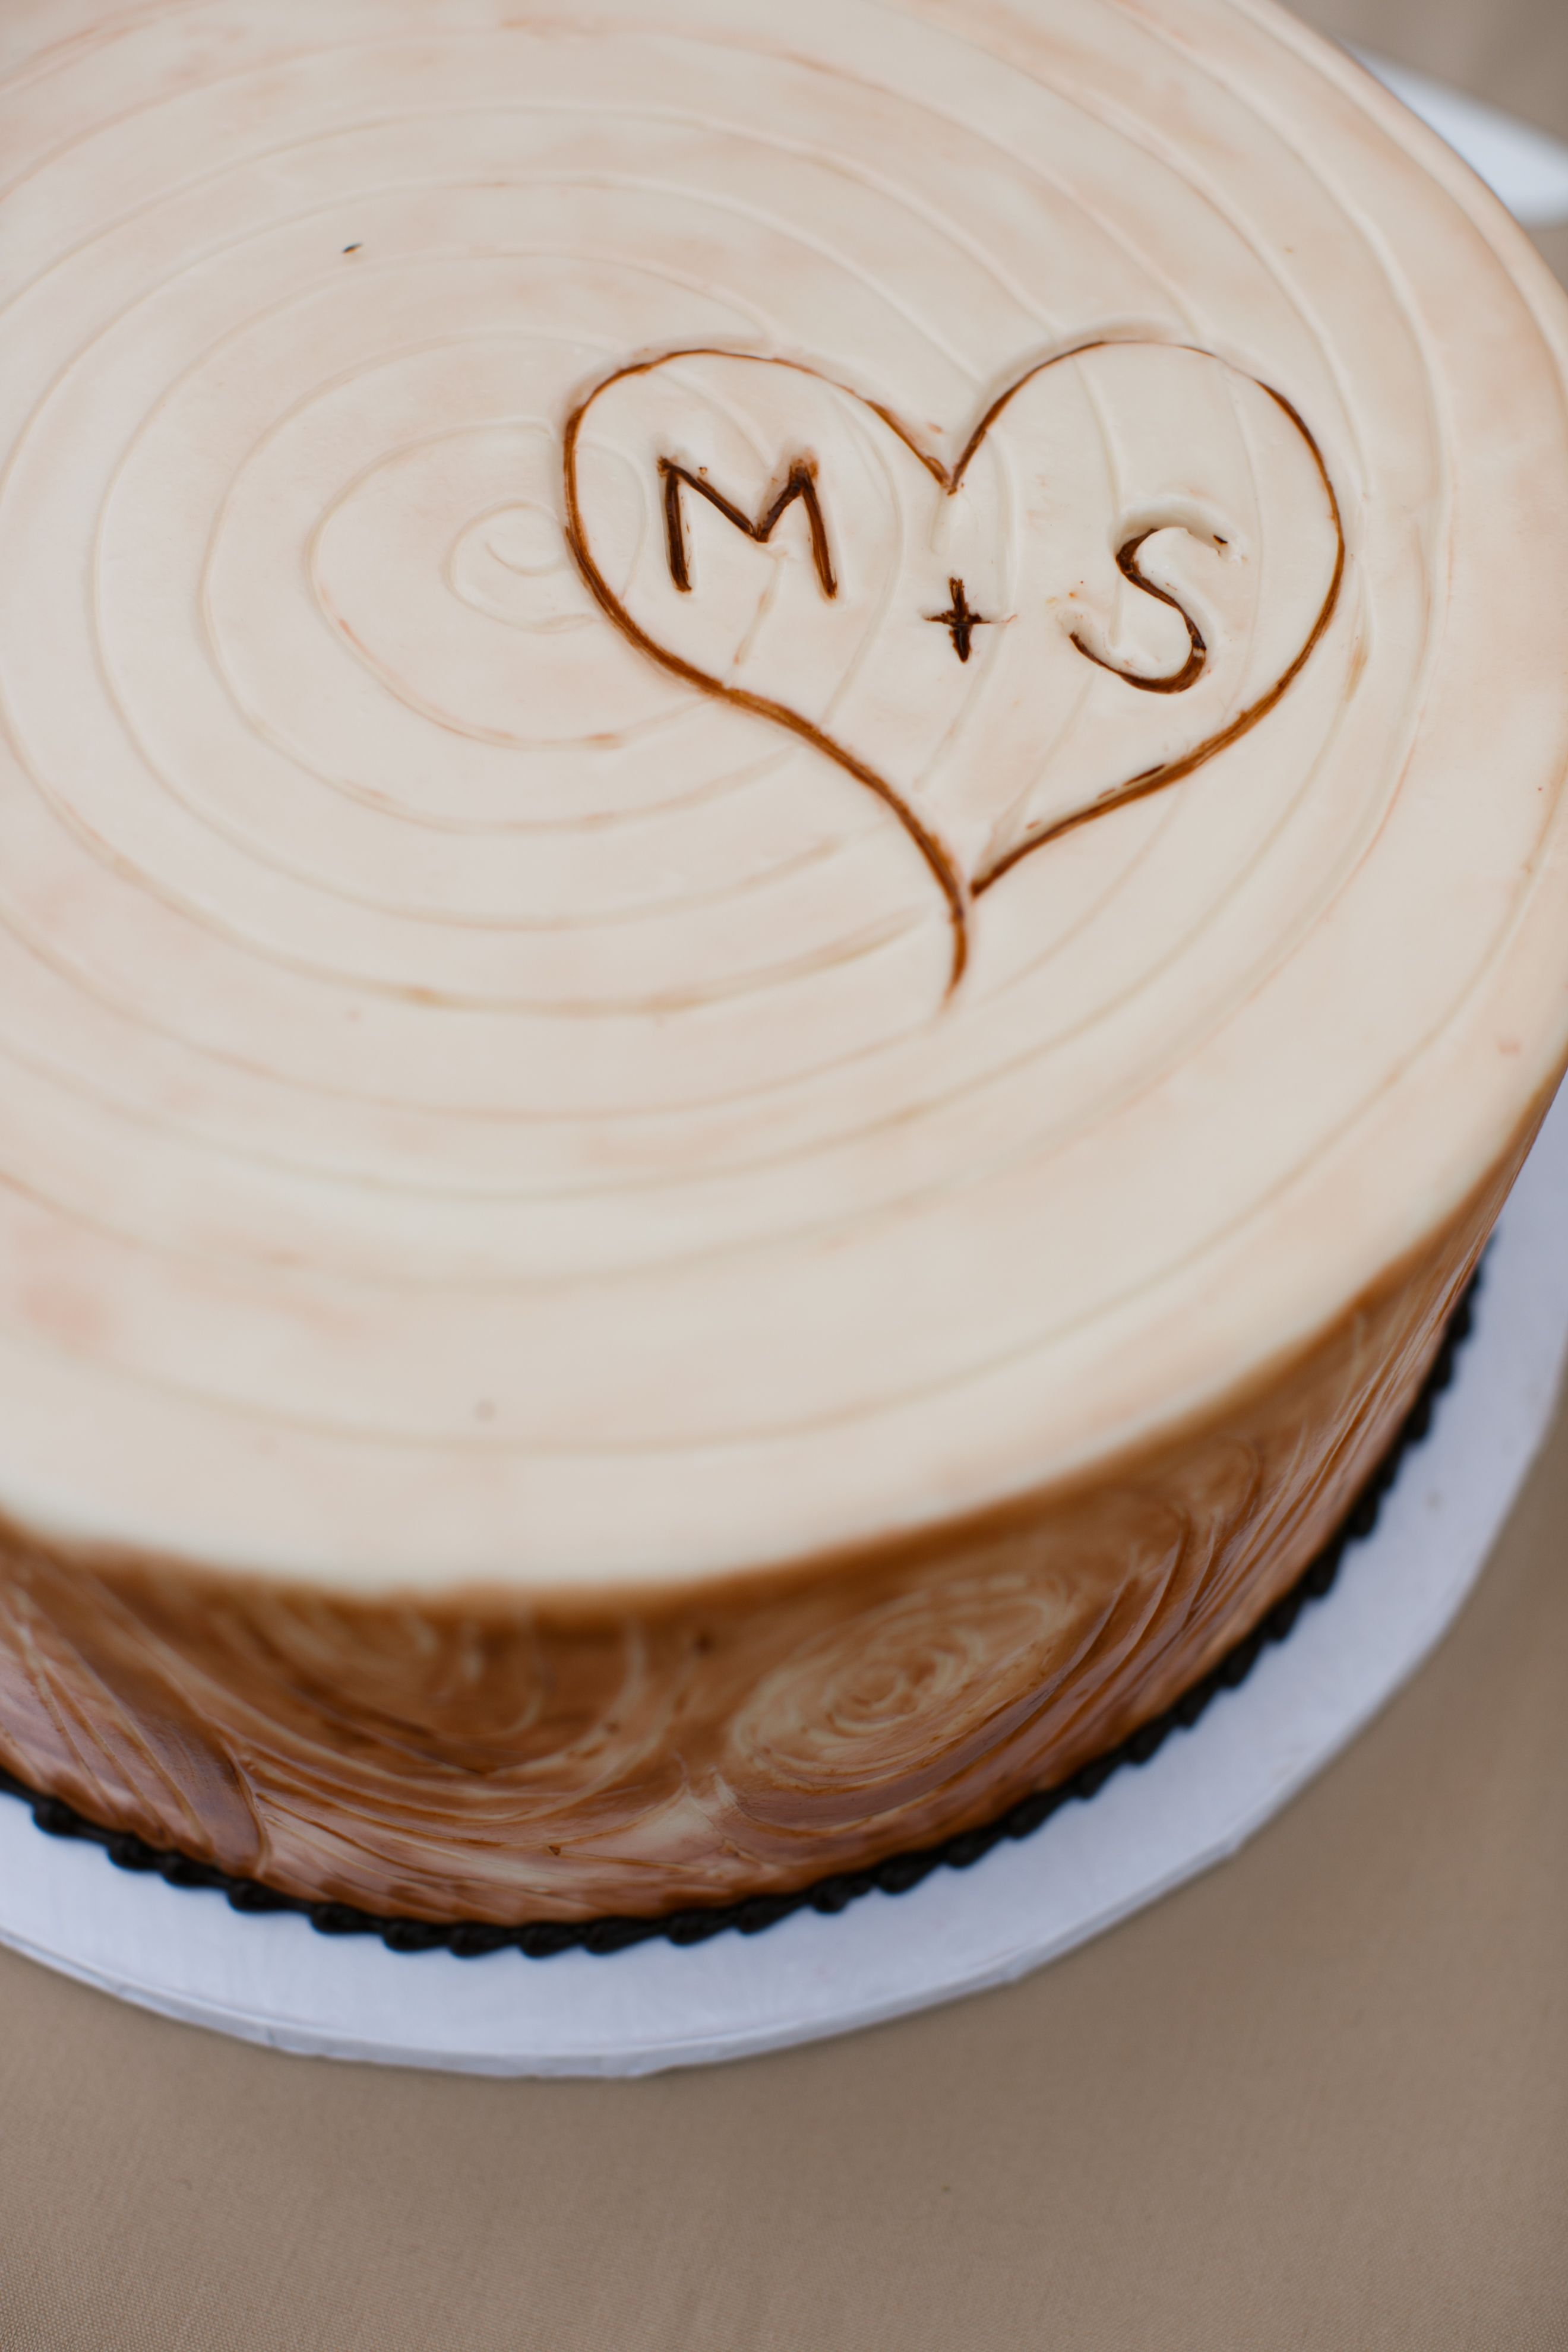 Beach wedding looks  Malibu Beach Wedding  Groomus Cake looks like the centerpiece on